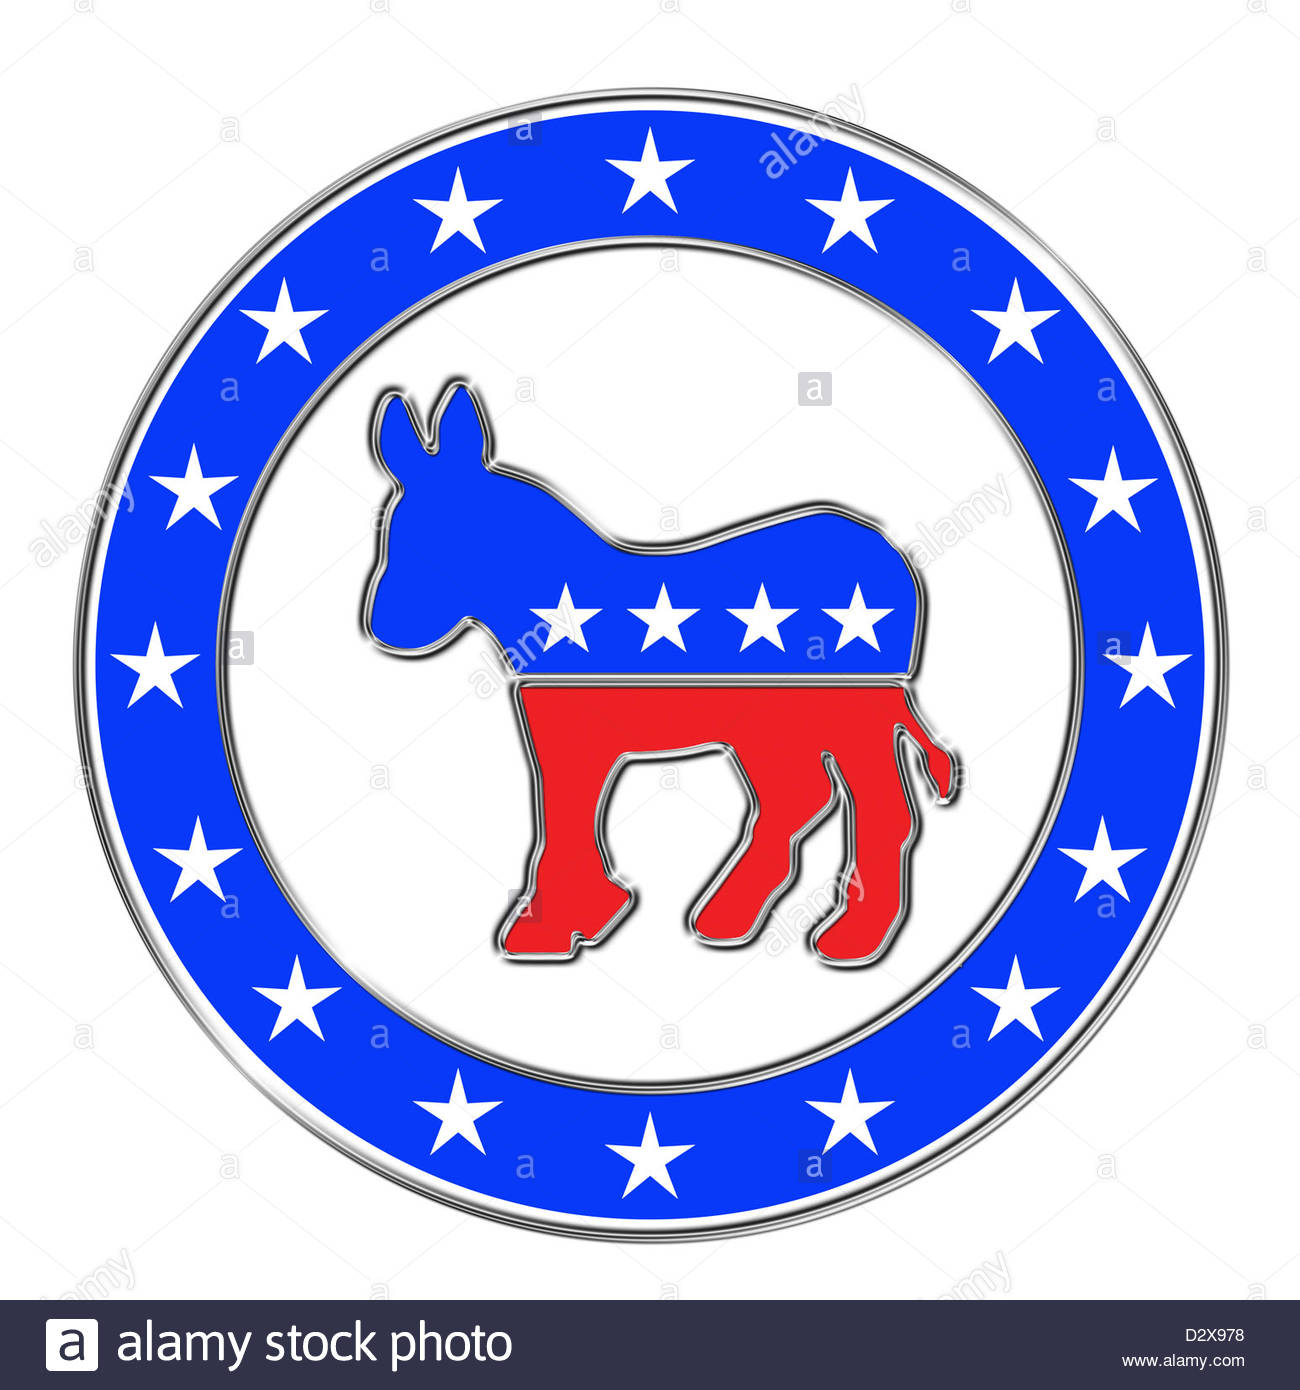 Democratic party logo stock photo 53438428 alamy democratic party logo biocorpaavc Image collections